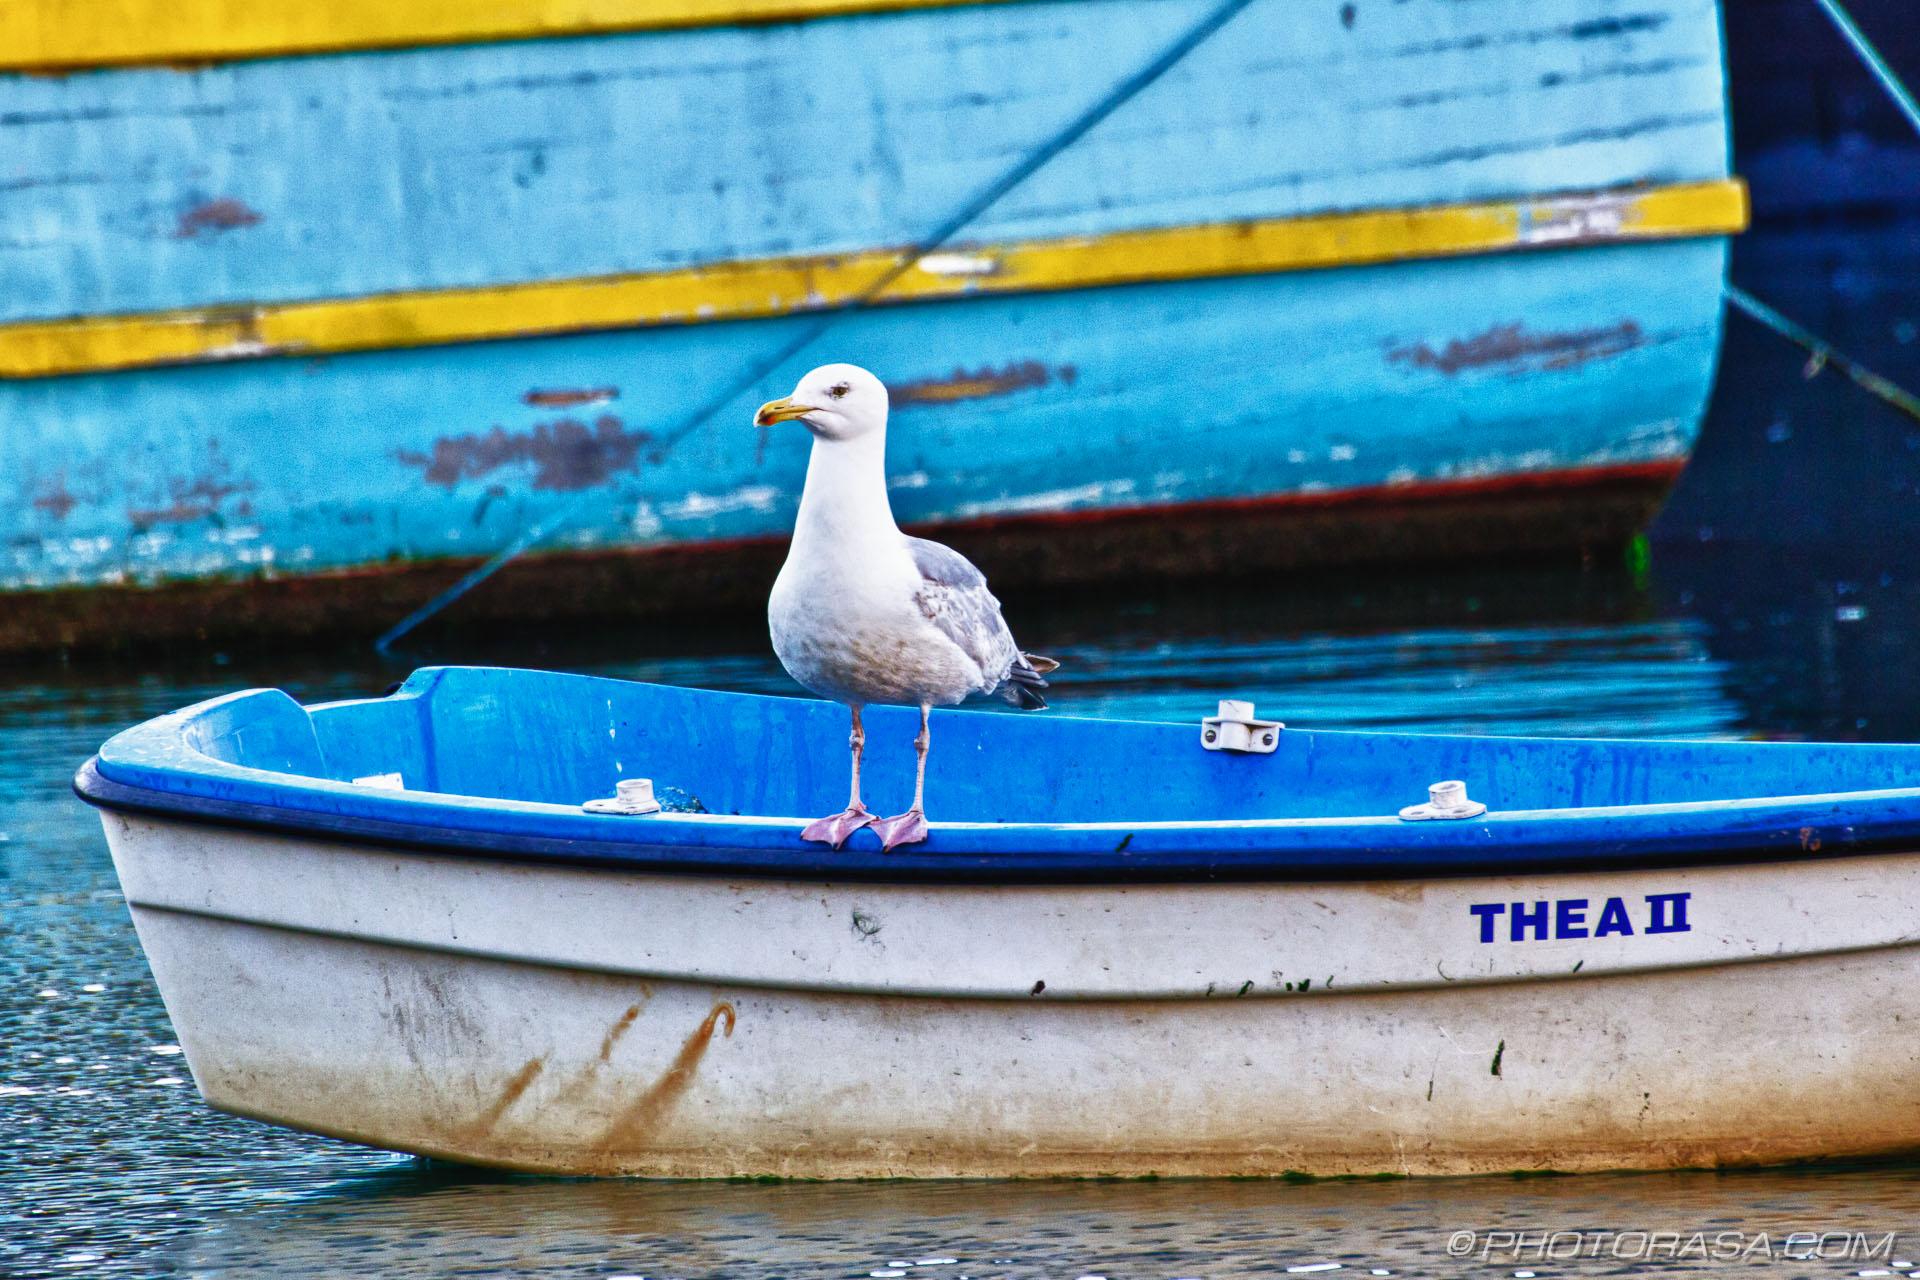 https://photorasa.com/seagulls/seagull-on-row-boat/